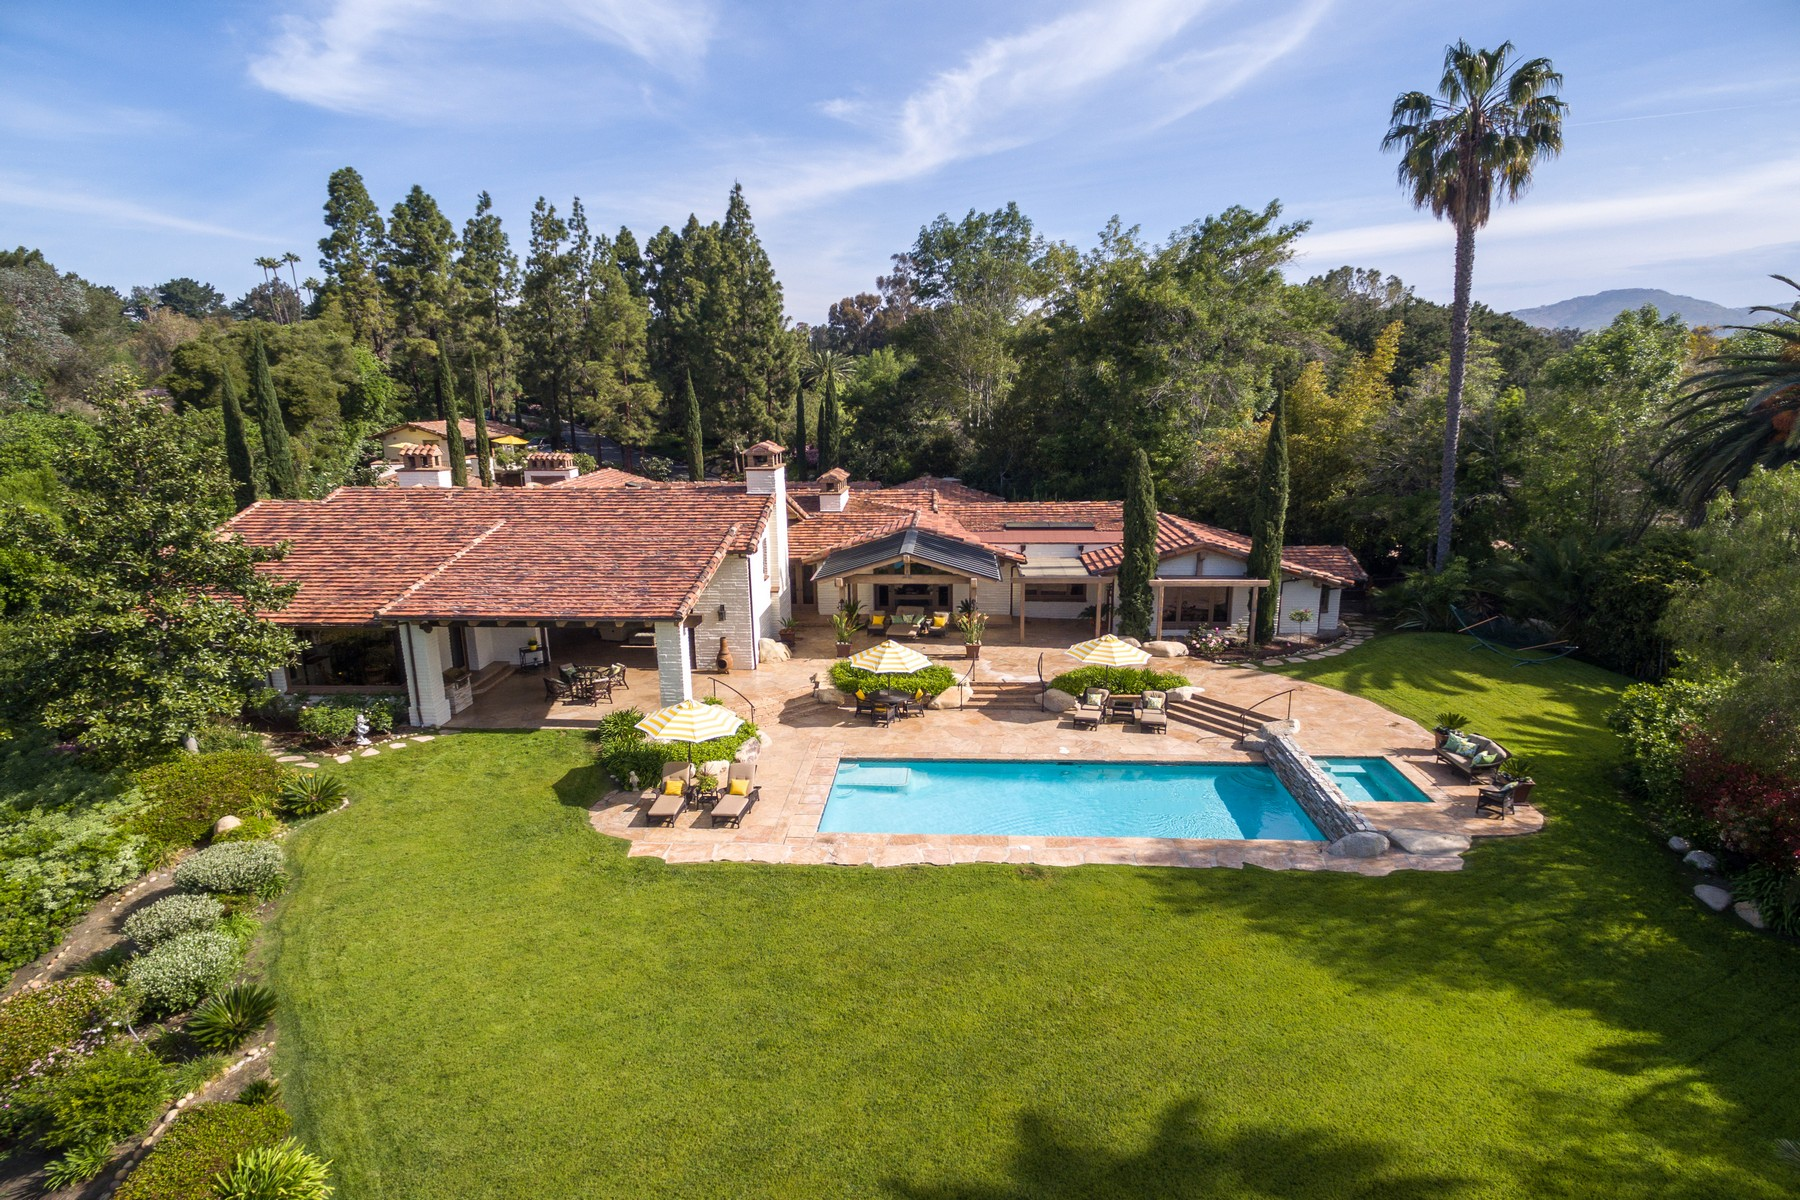 Moradia para Venda às 6083 Mimulus Rancho Santa Fe, Califórnia, 92067 Estados Unidos